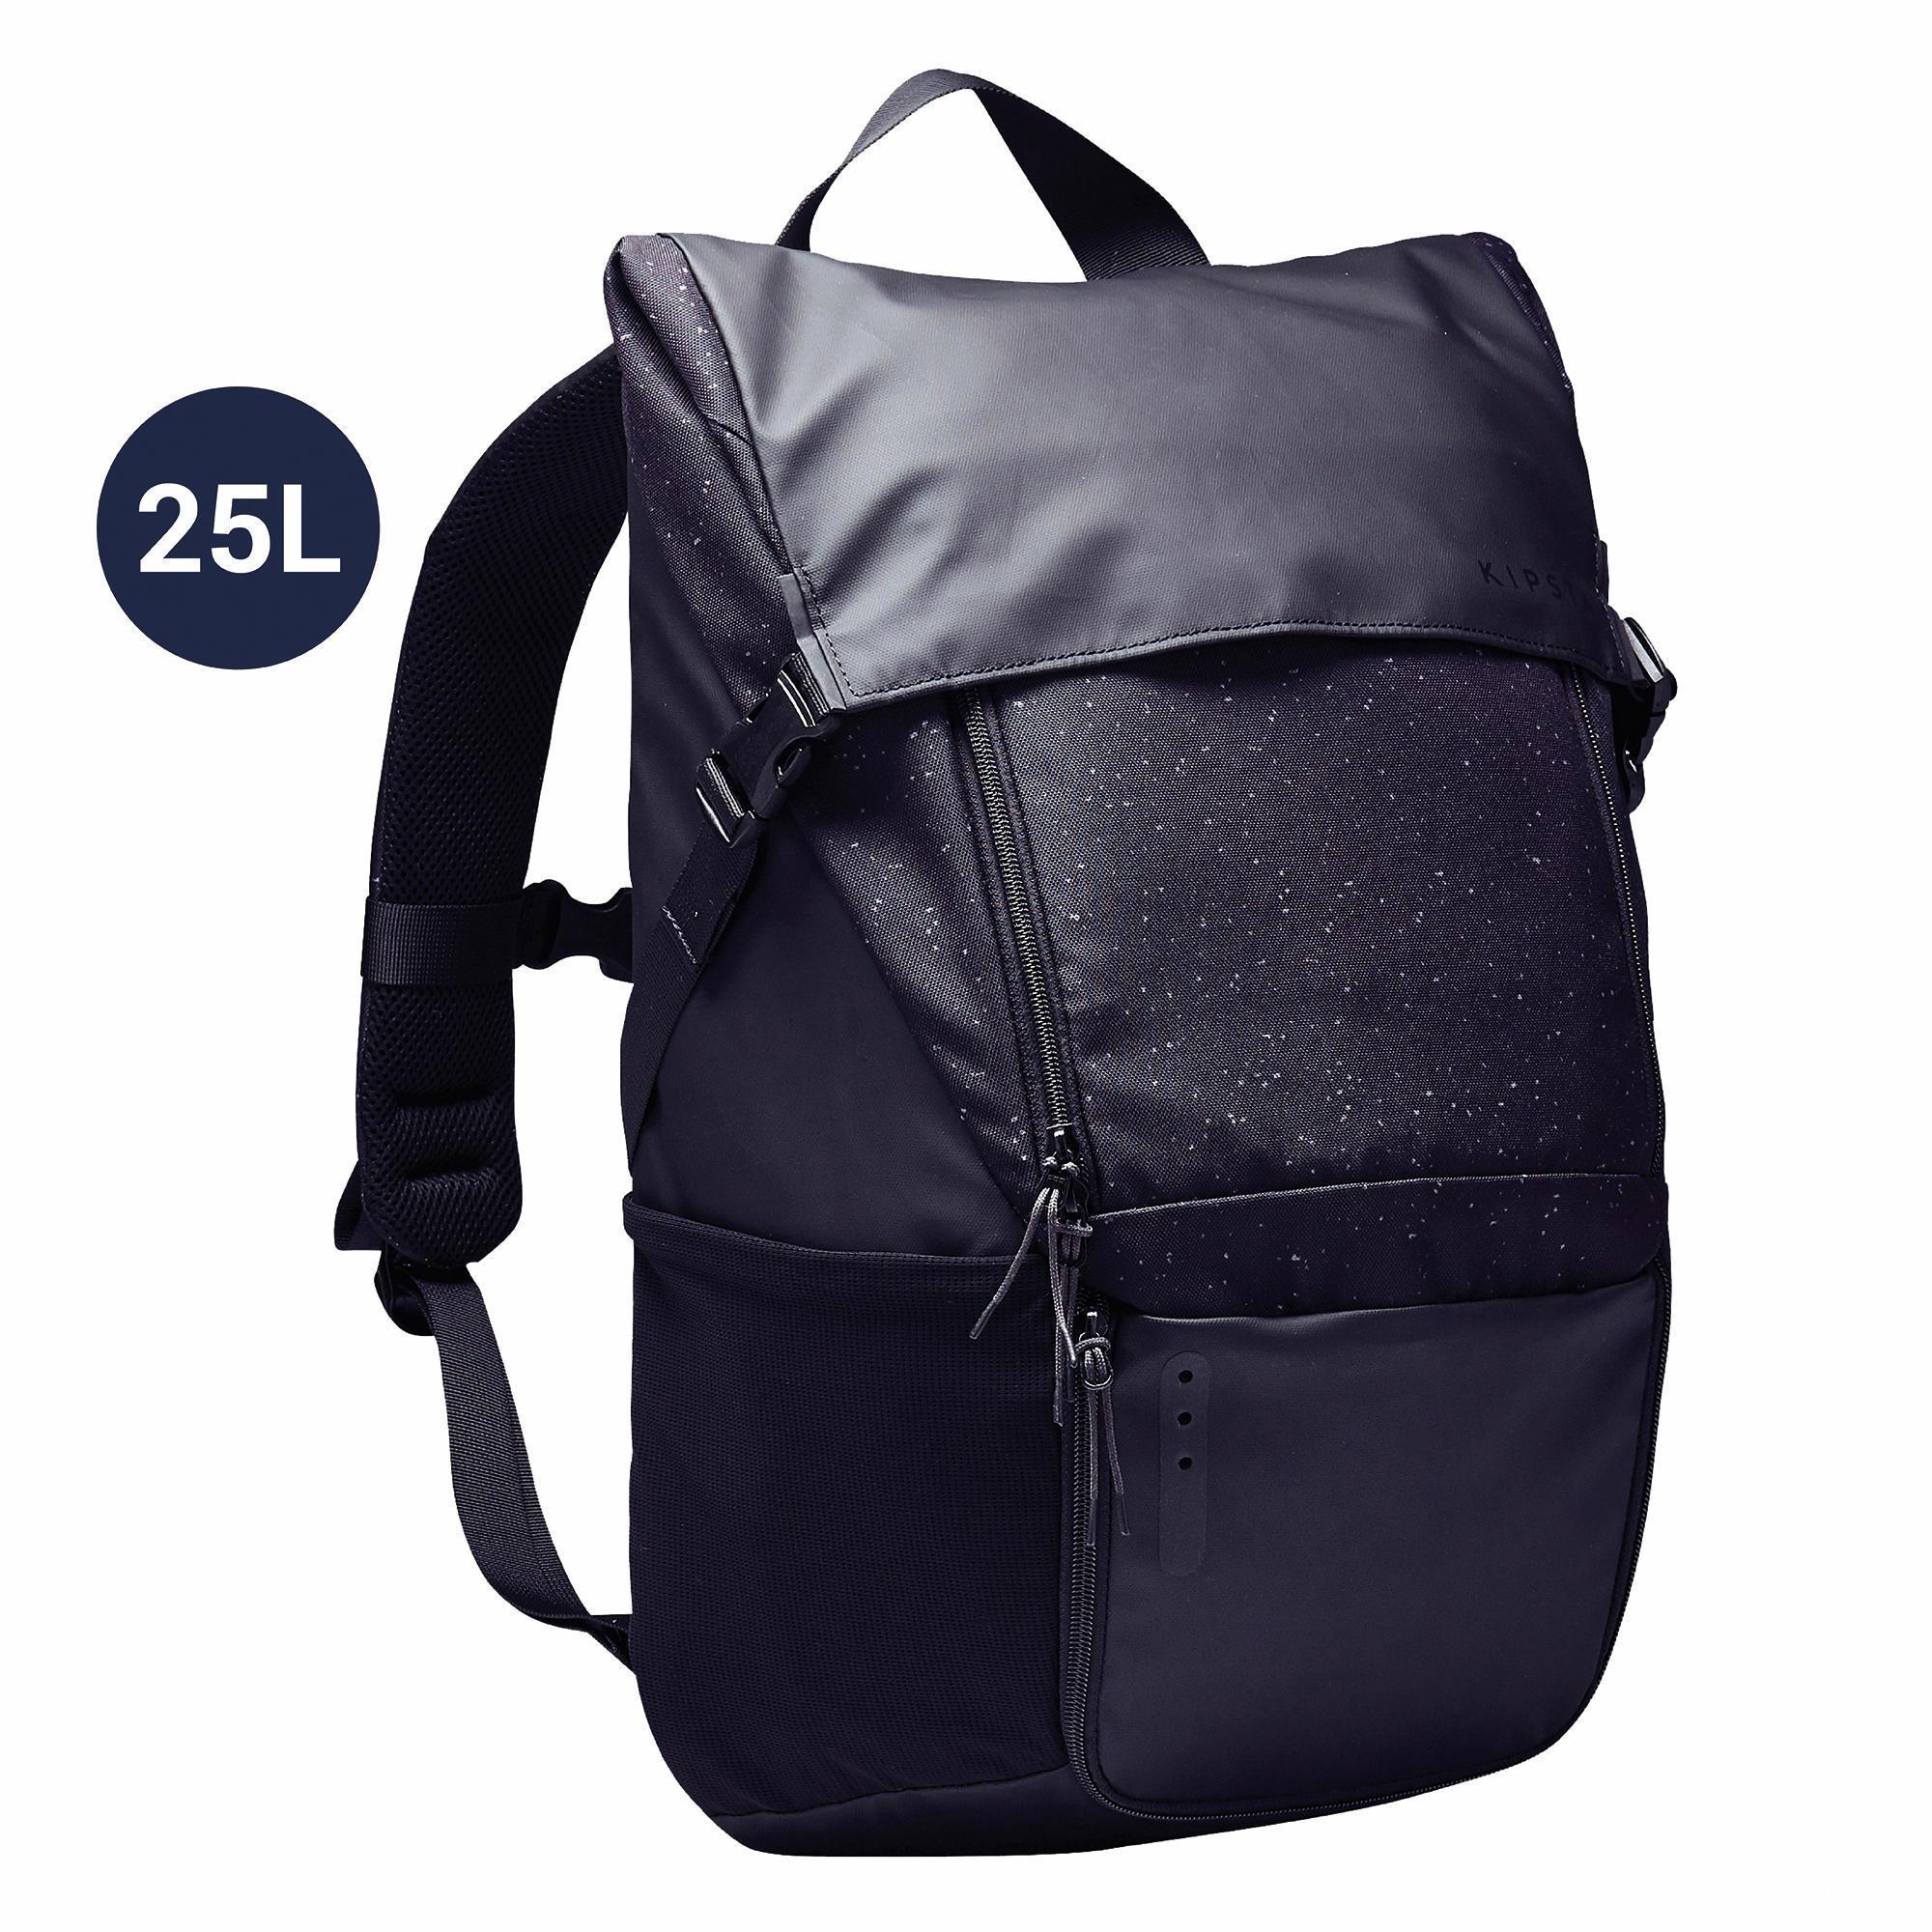 ba67de622e Backpack Rucksack Damen 60 L- Fenix Toulouse Handball